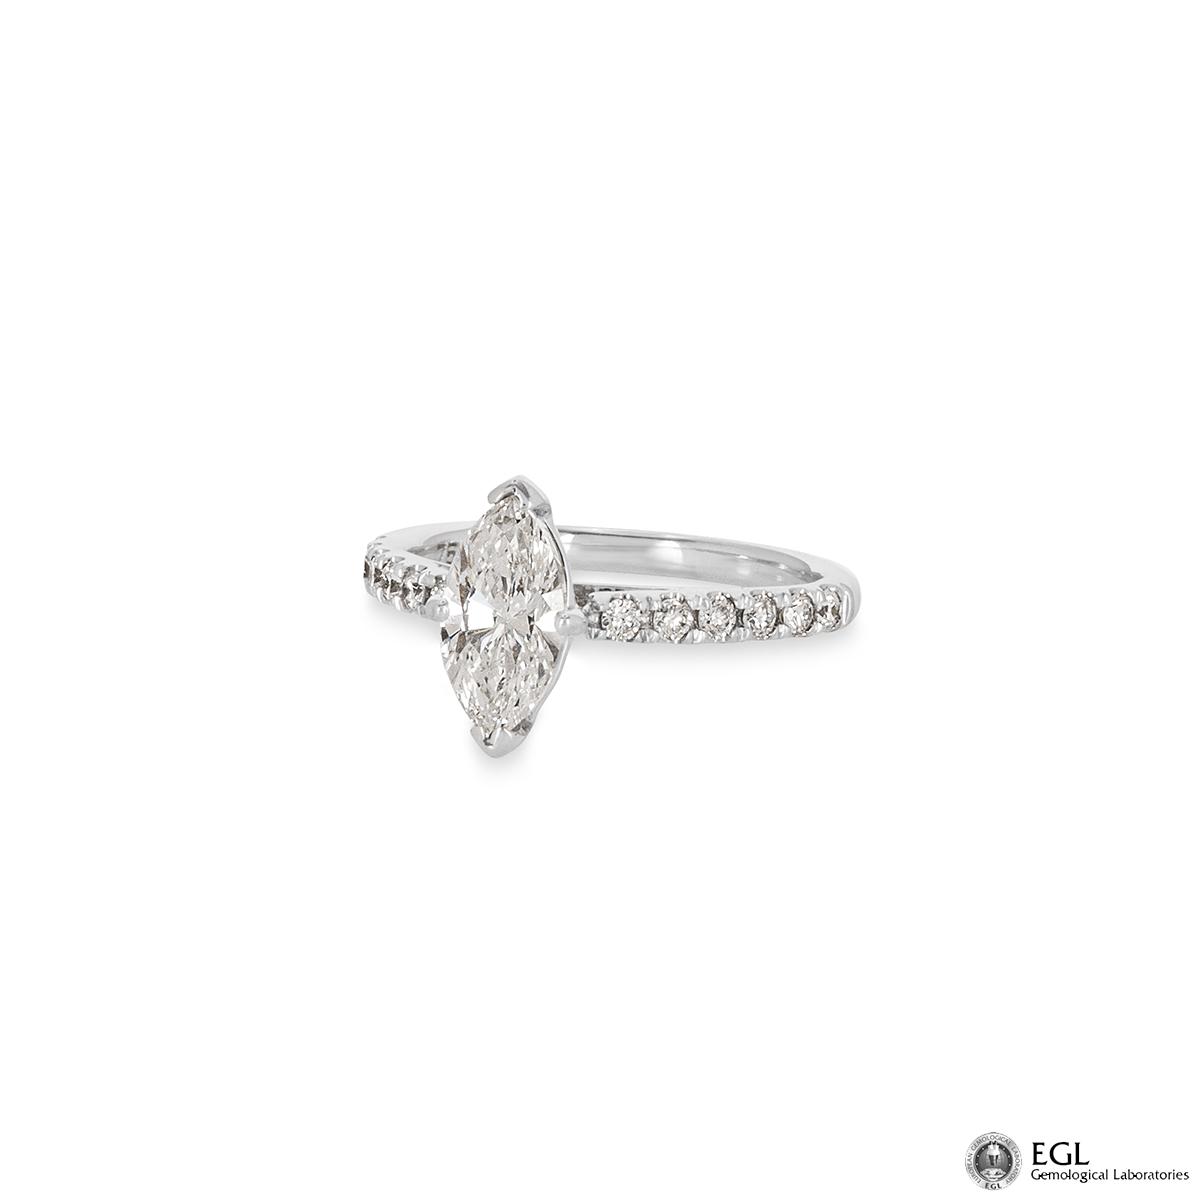 18k White Gold Marquise Cut Diamond Ring 1.01ct G/SI2